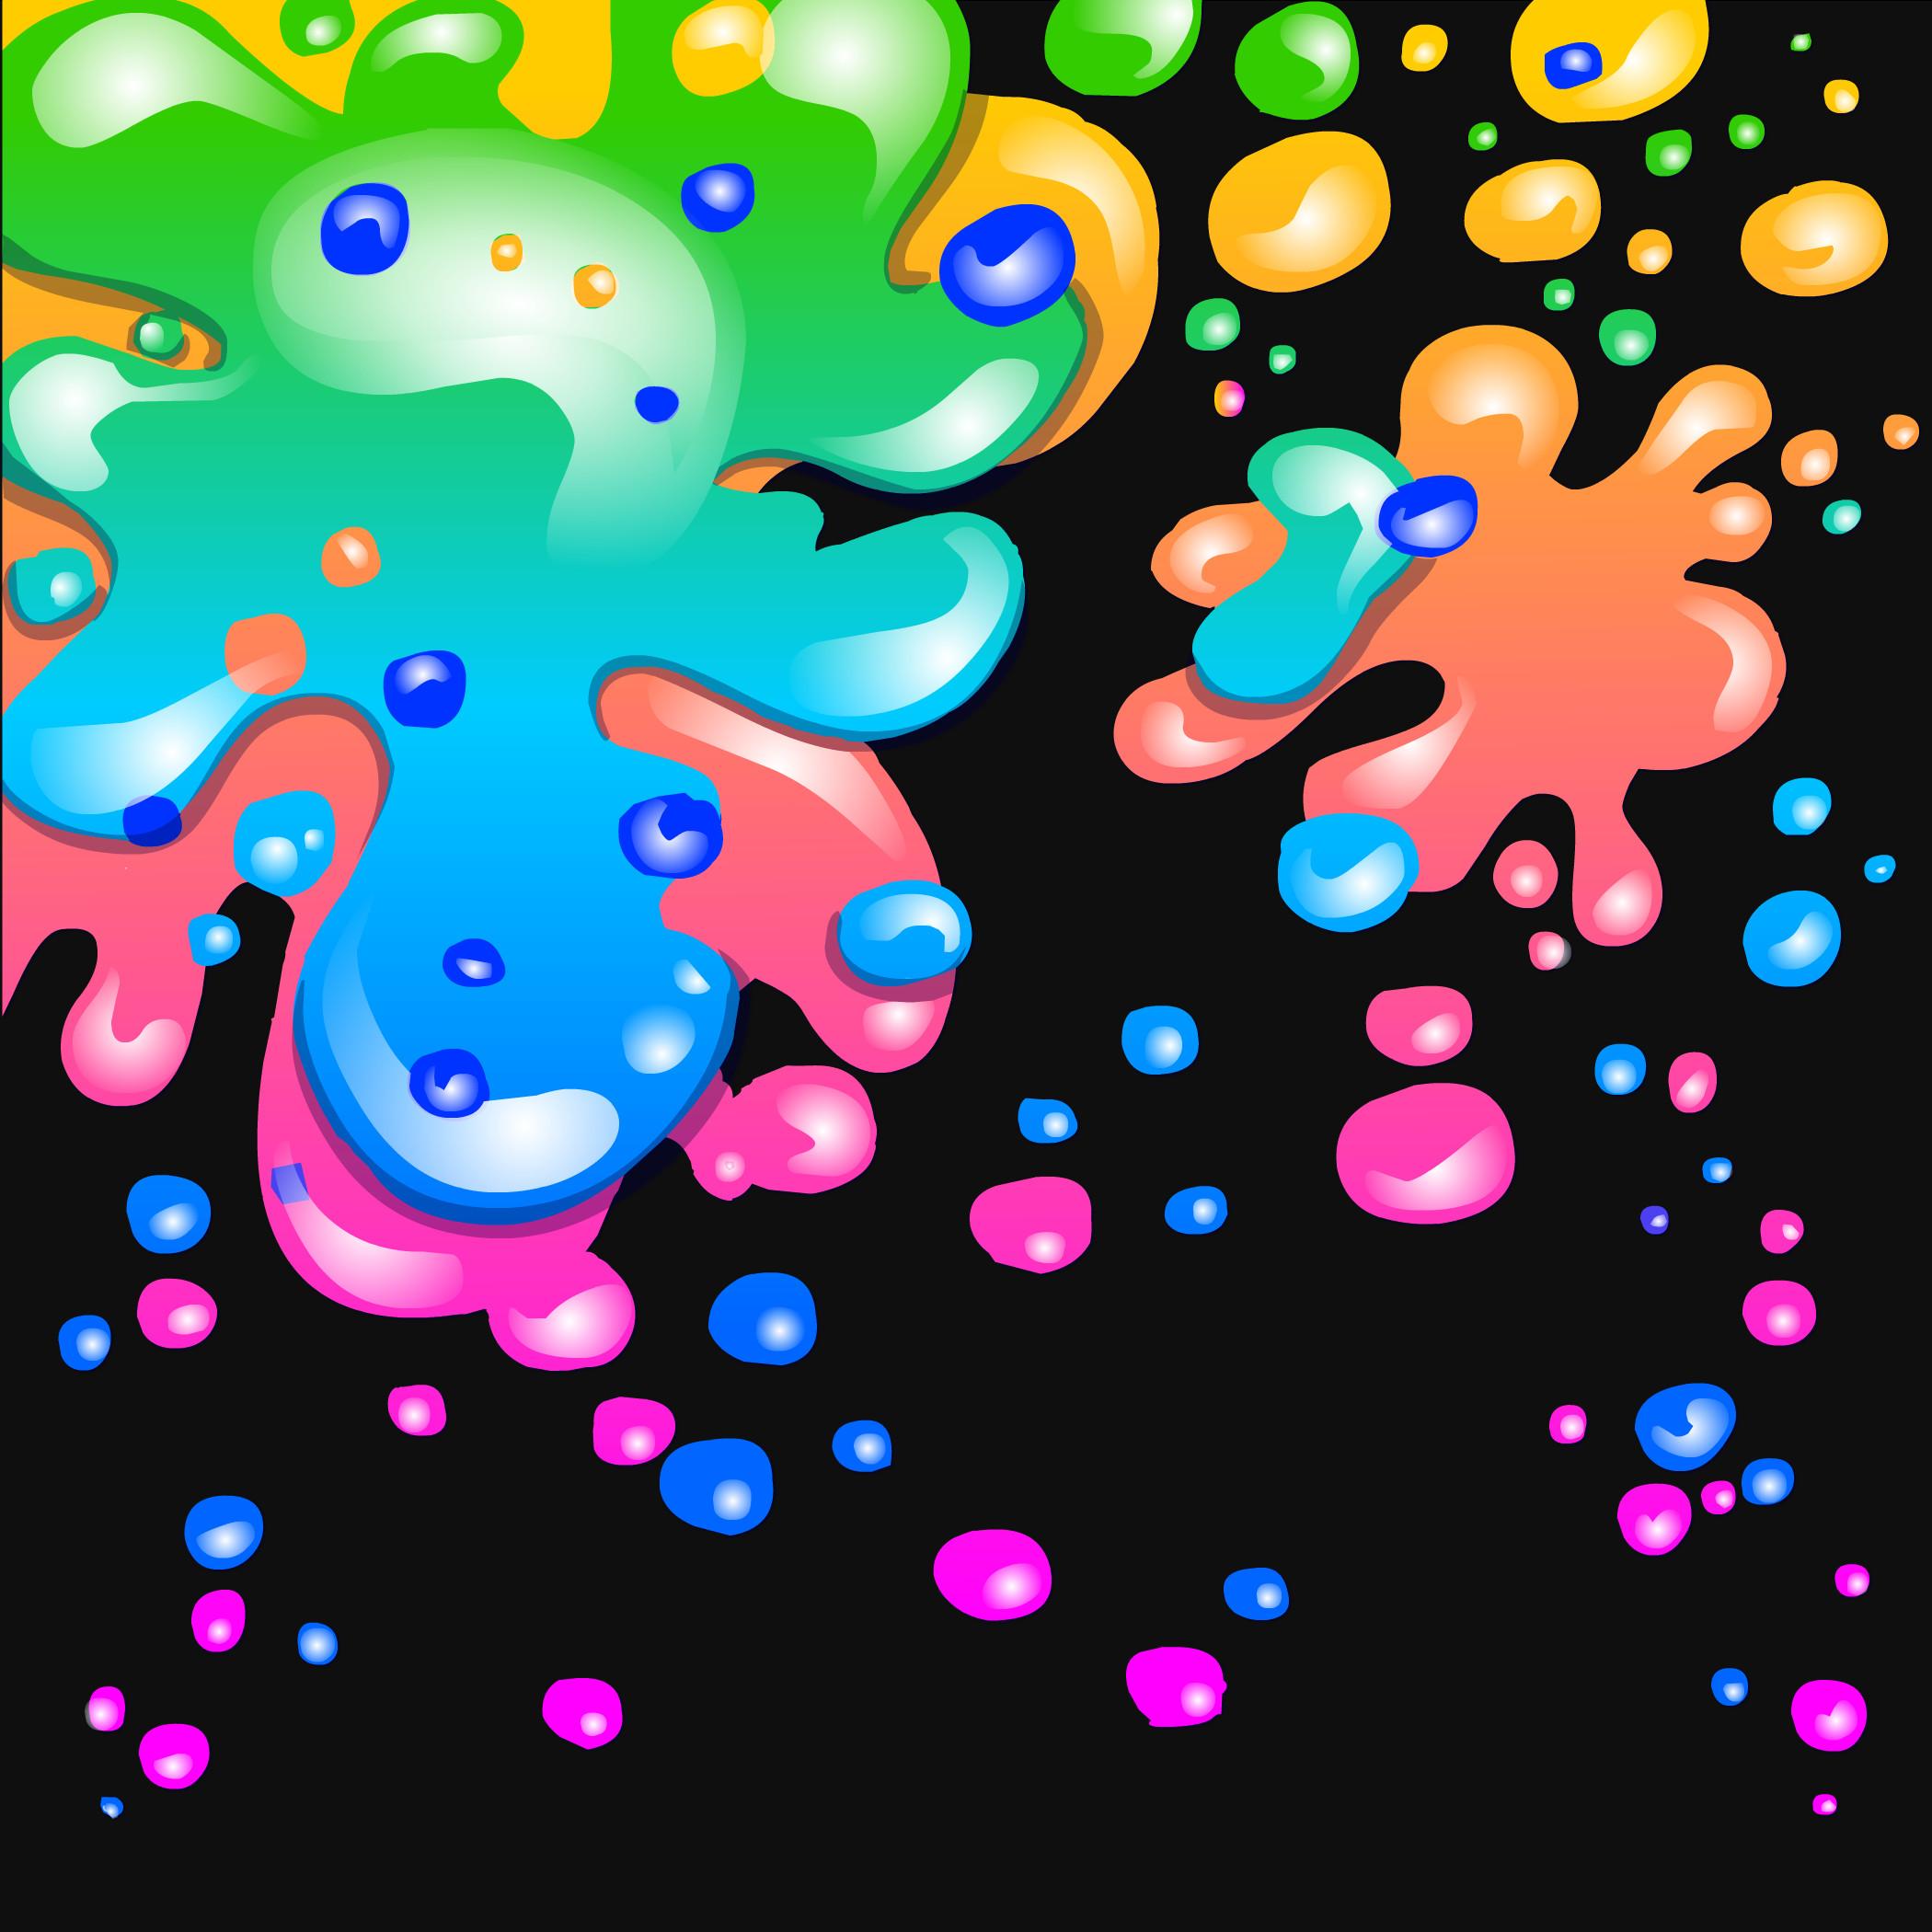 Neon Rainbow Background Designs ·①  Neon Rainbow Ba...